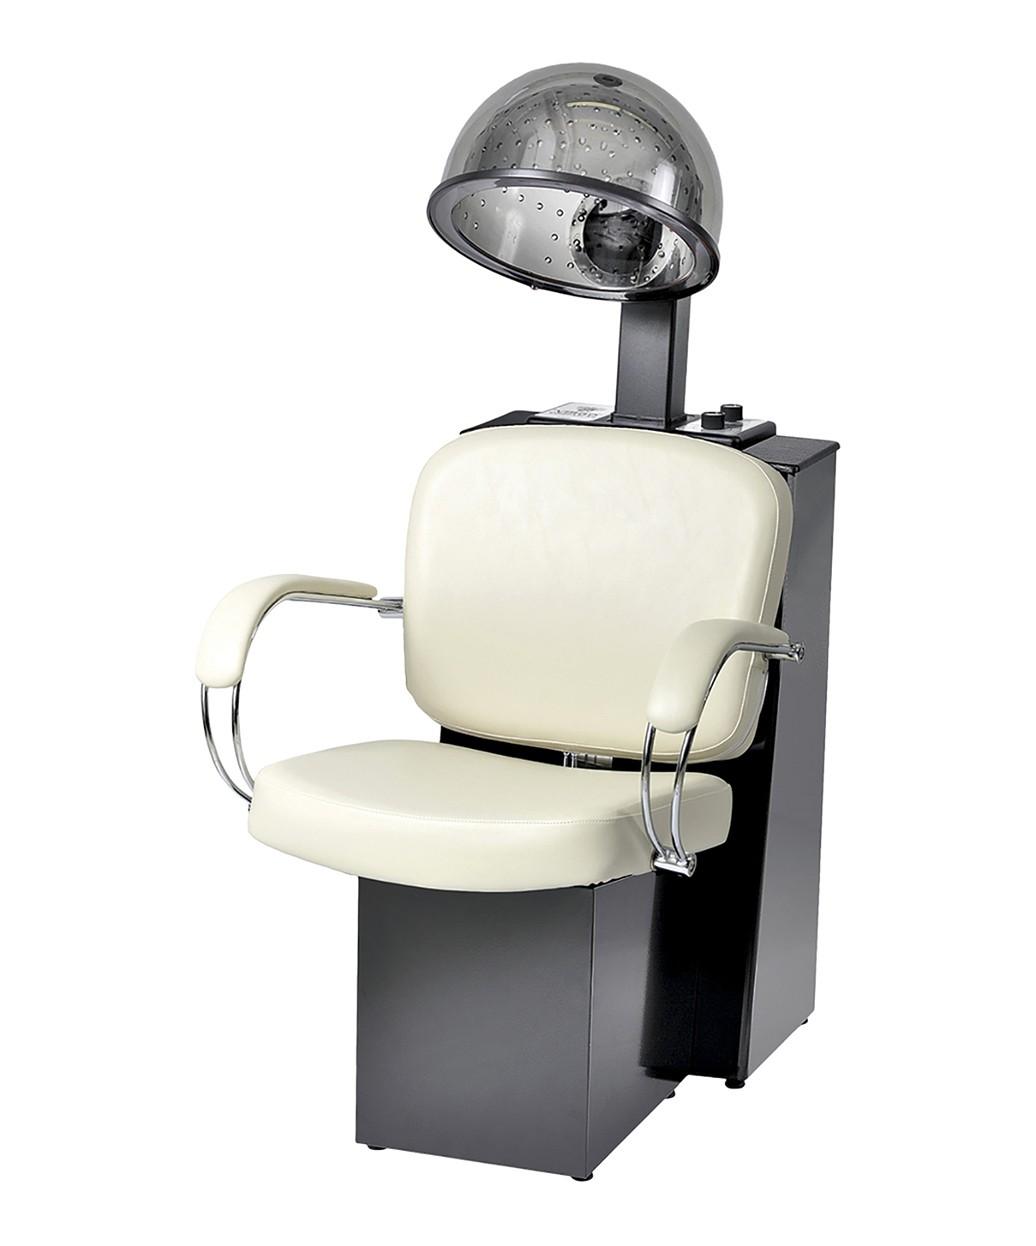 chair hair dryer cover hire uxbridge pibbs 3969 latina